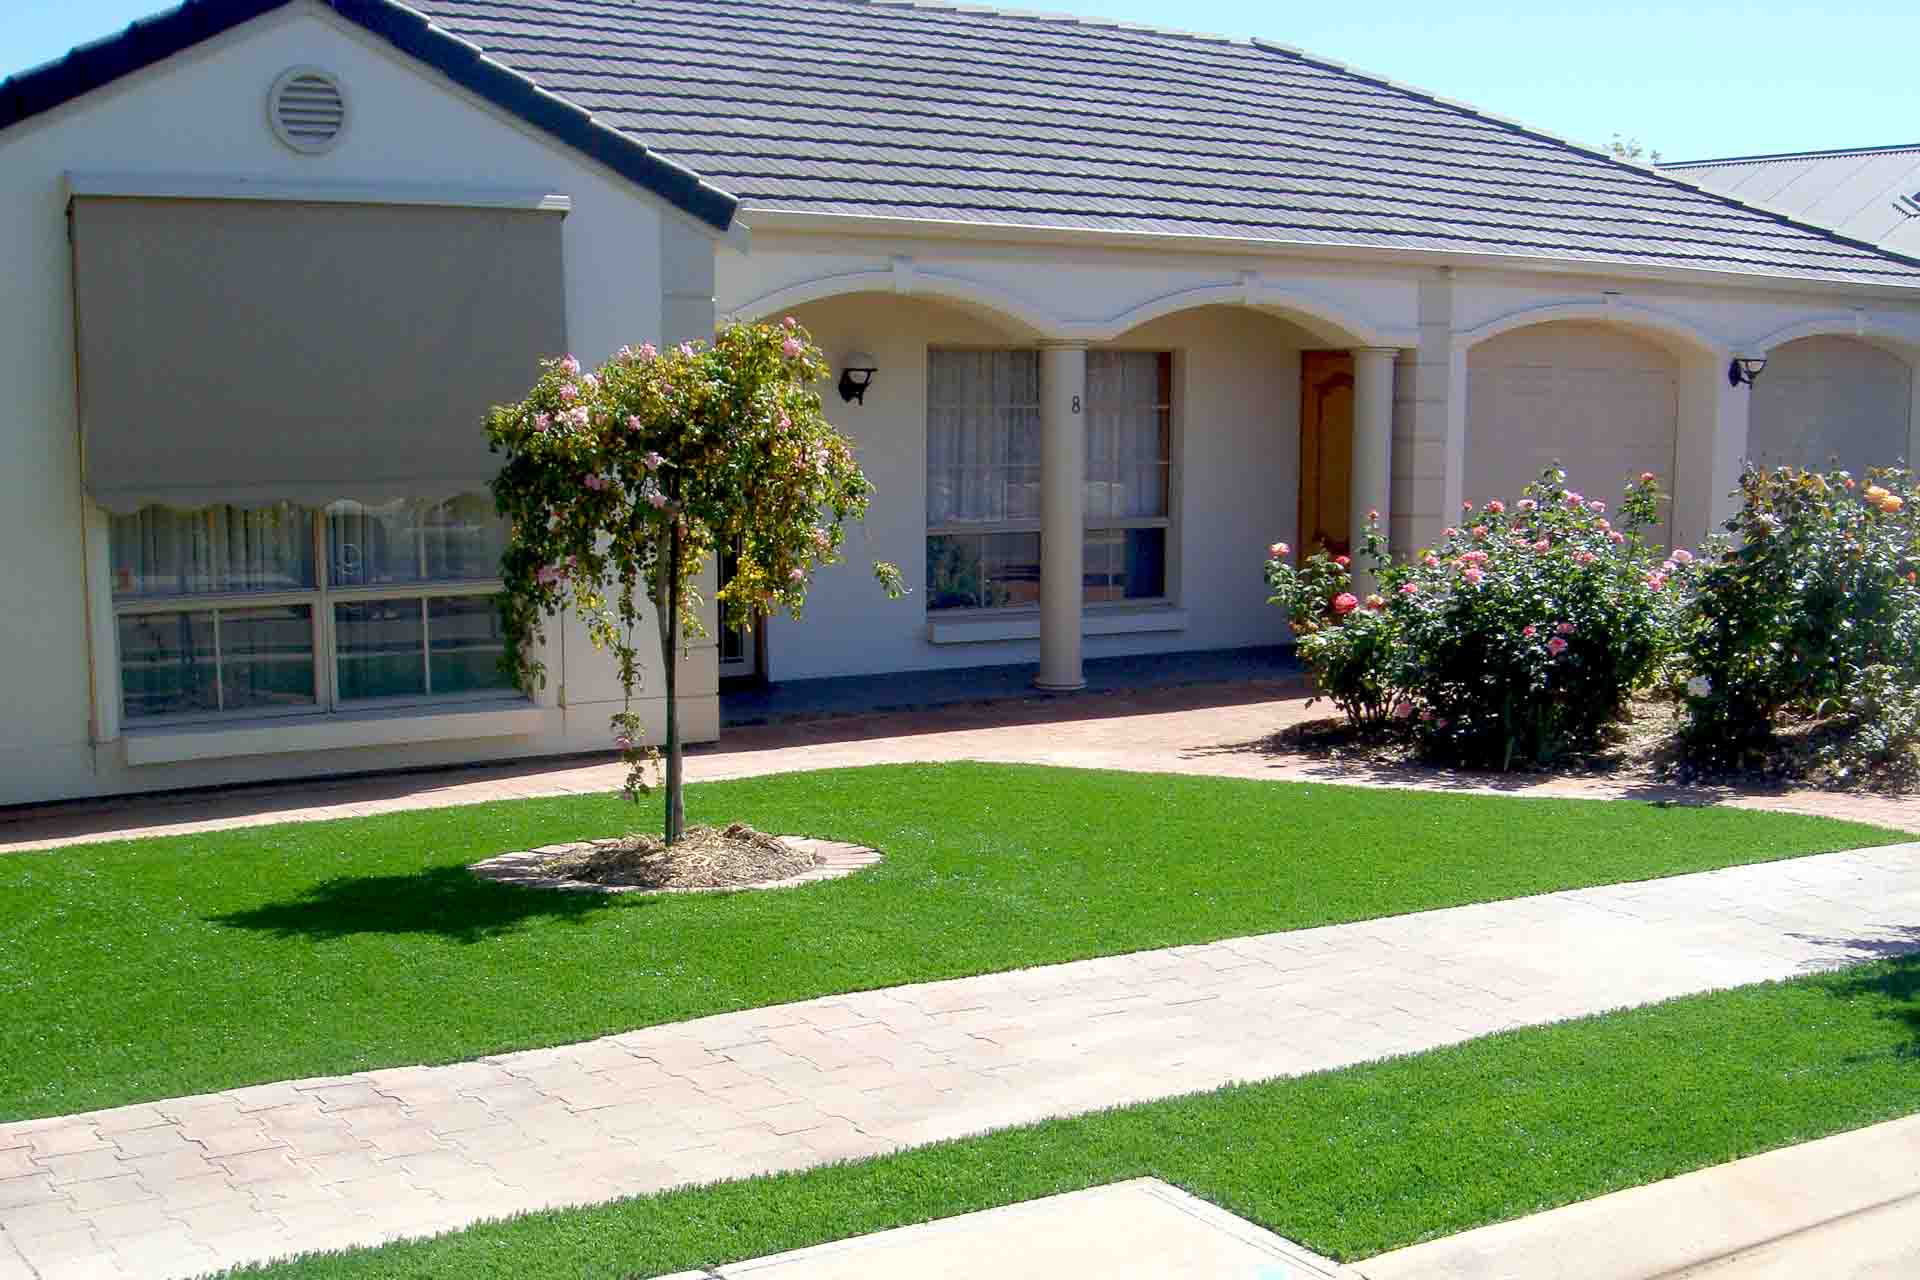 Artificial Grass Lawns - The low maintenance alternative.